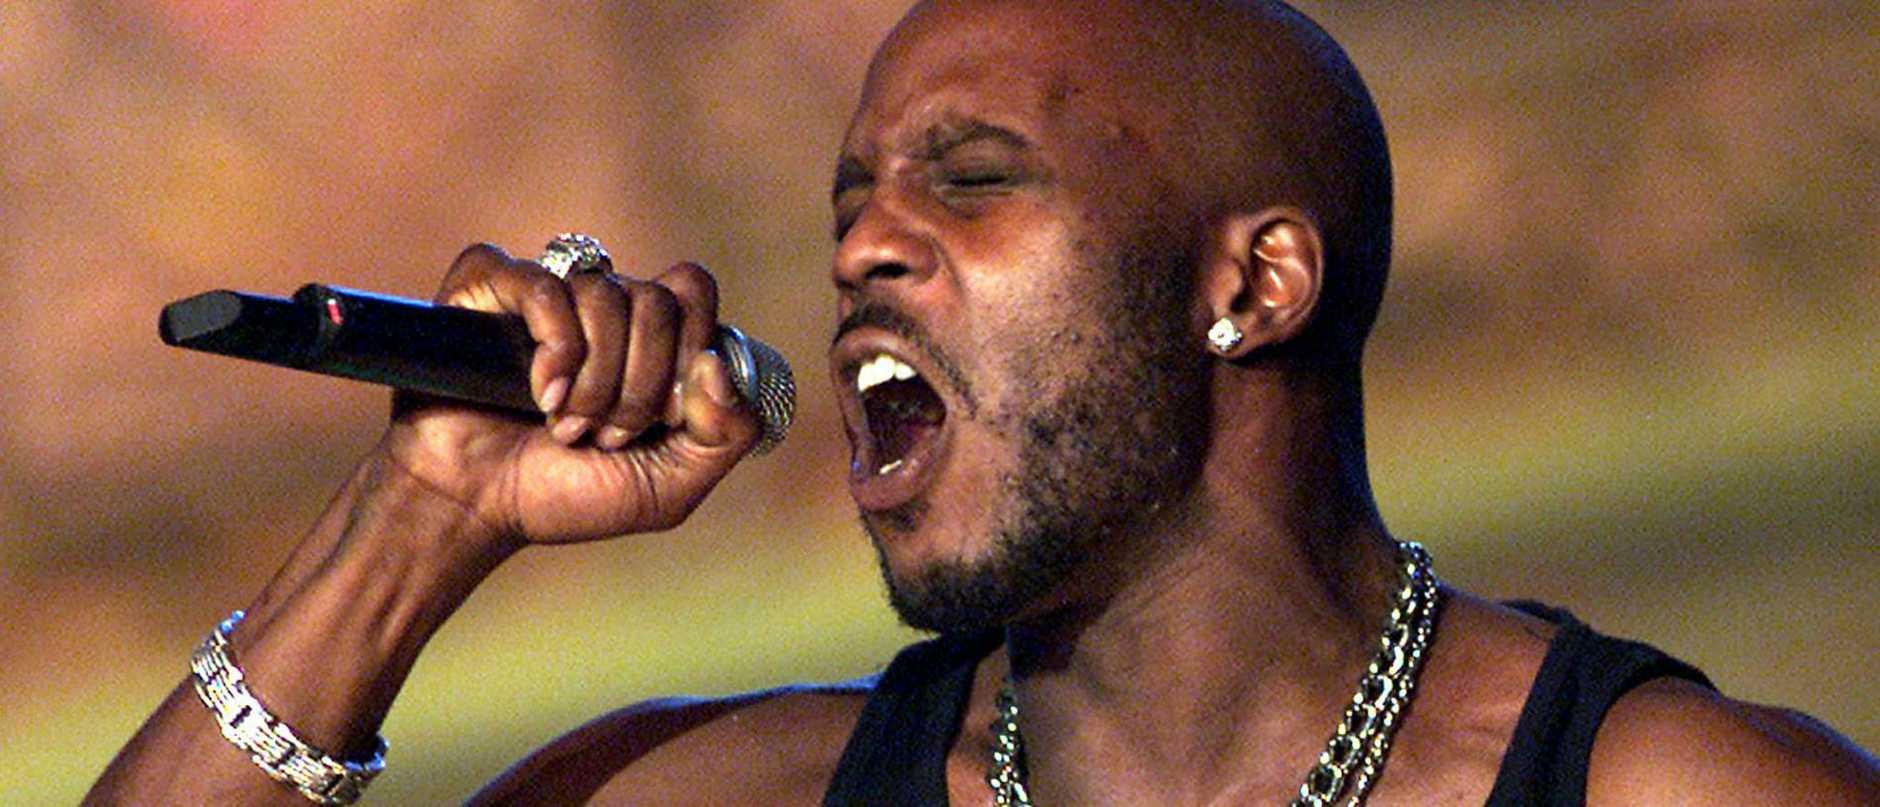 (FILE) Rapper DMX Dies At 50 The Source Hip Hop Music Awards 2001